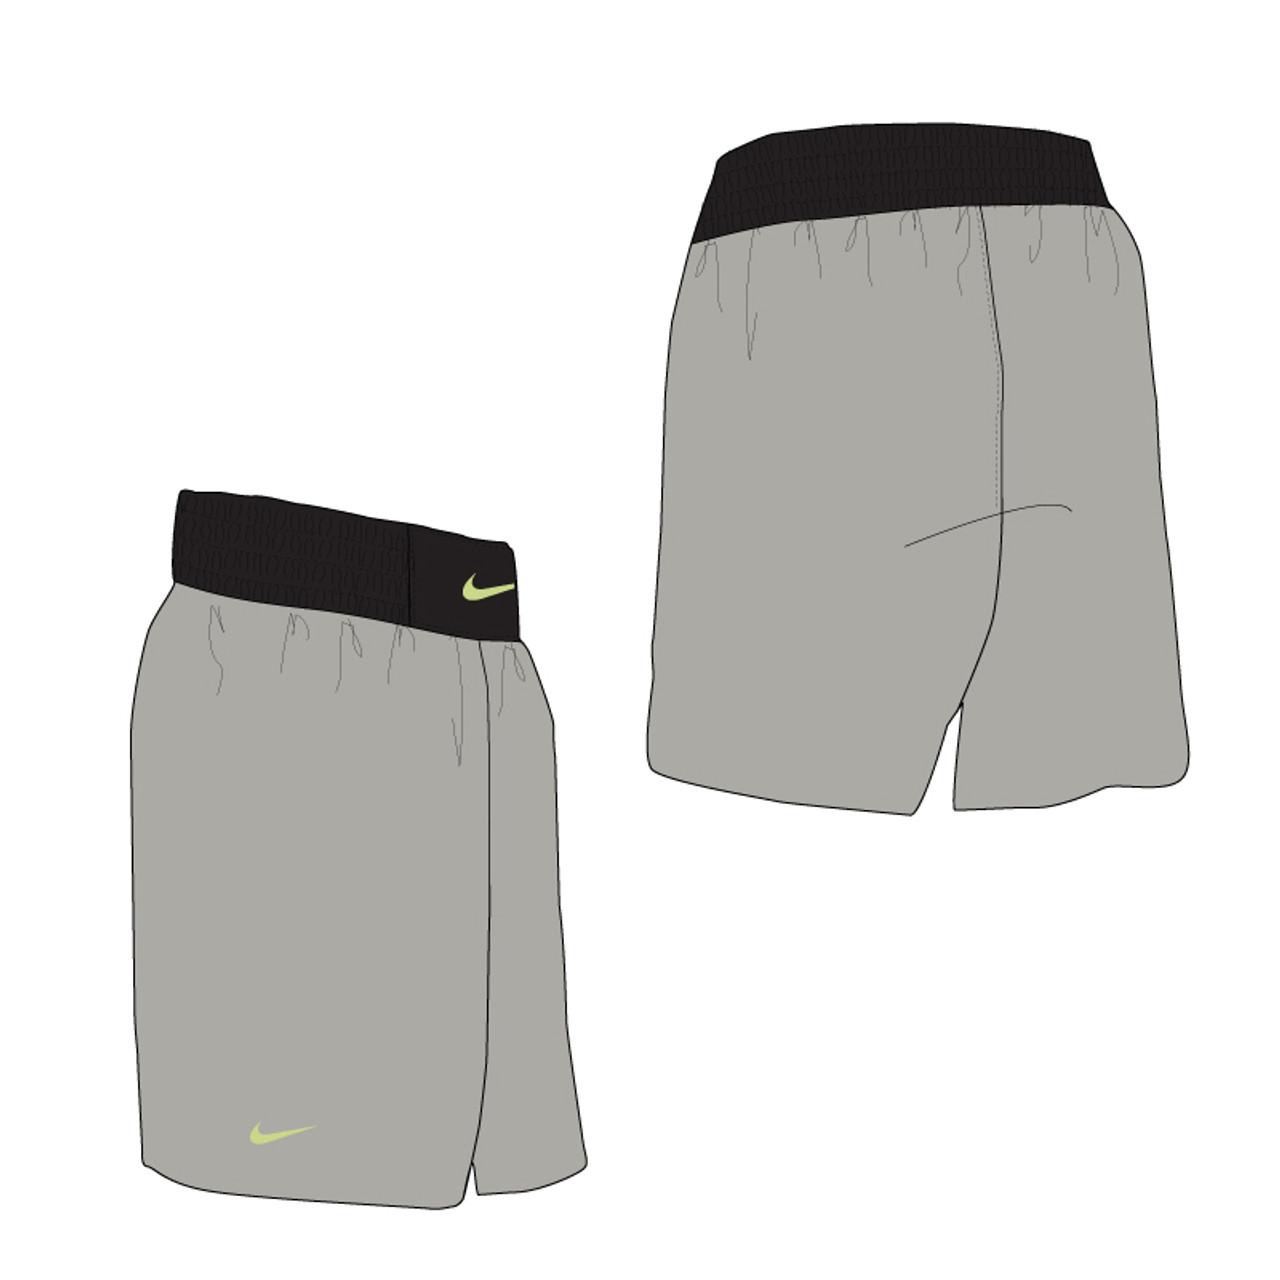 879a91bd2d Nike Boxing Short - Pewter / Black - Athlete Performance Solutions EU